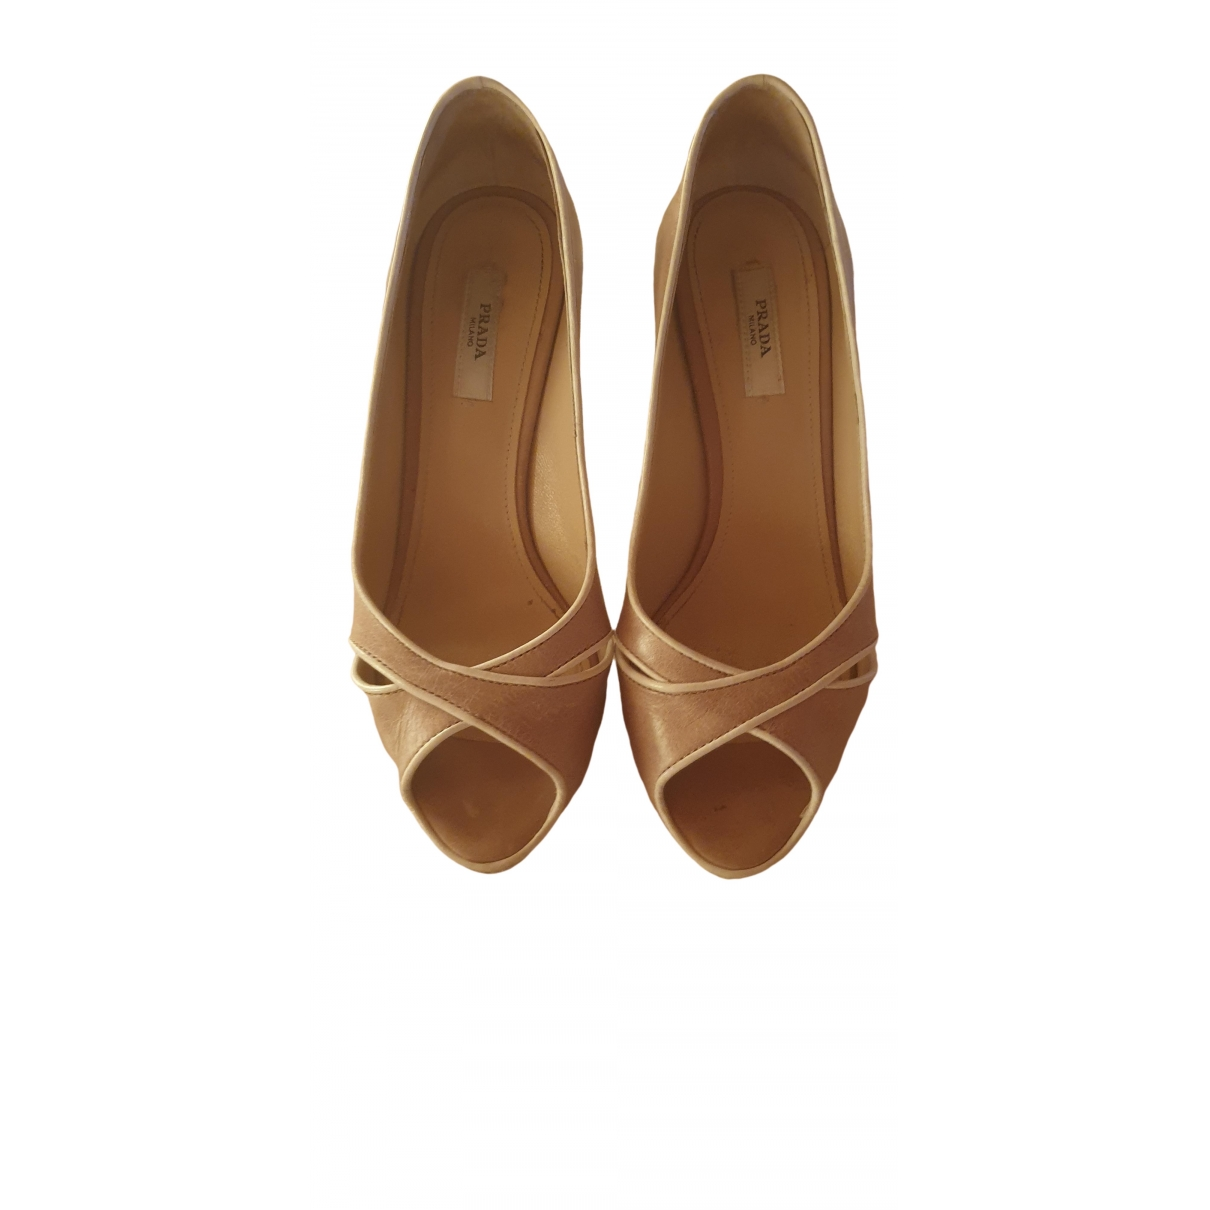 Prada \N Beige Leather Heels for Women 36 EU